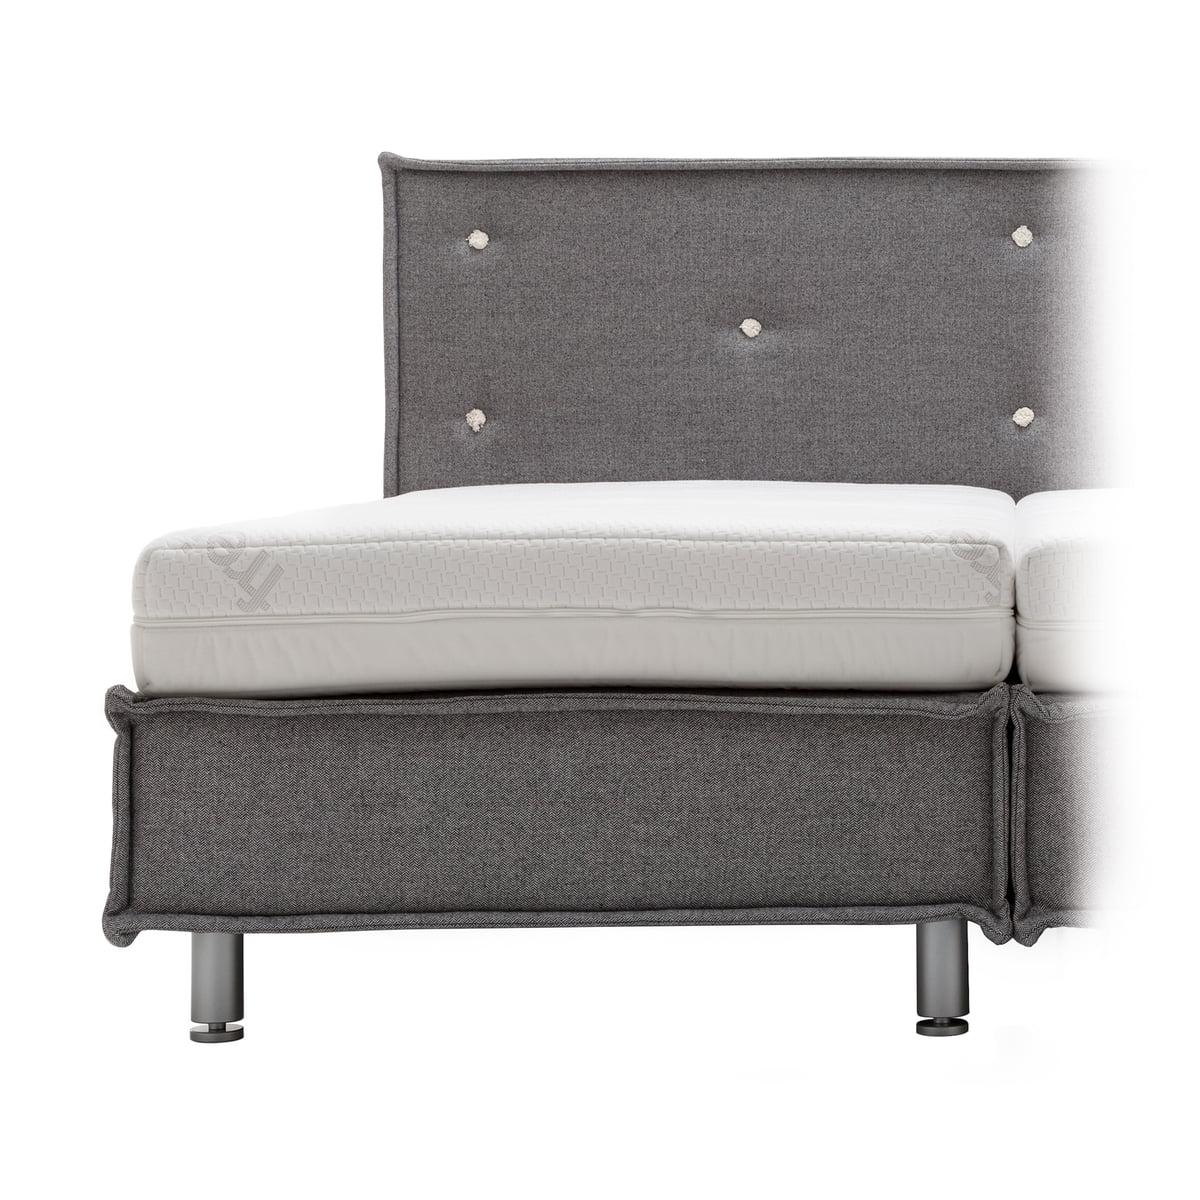 matratze f r 130 bett freistil. Black Bedroom Furniture Sets. Home Design Ideas